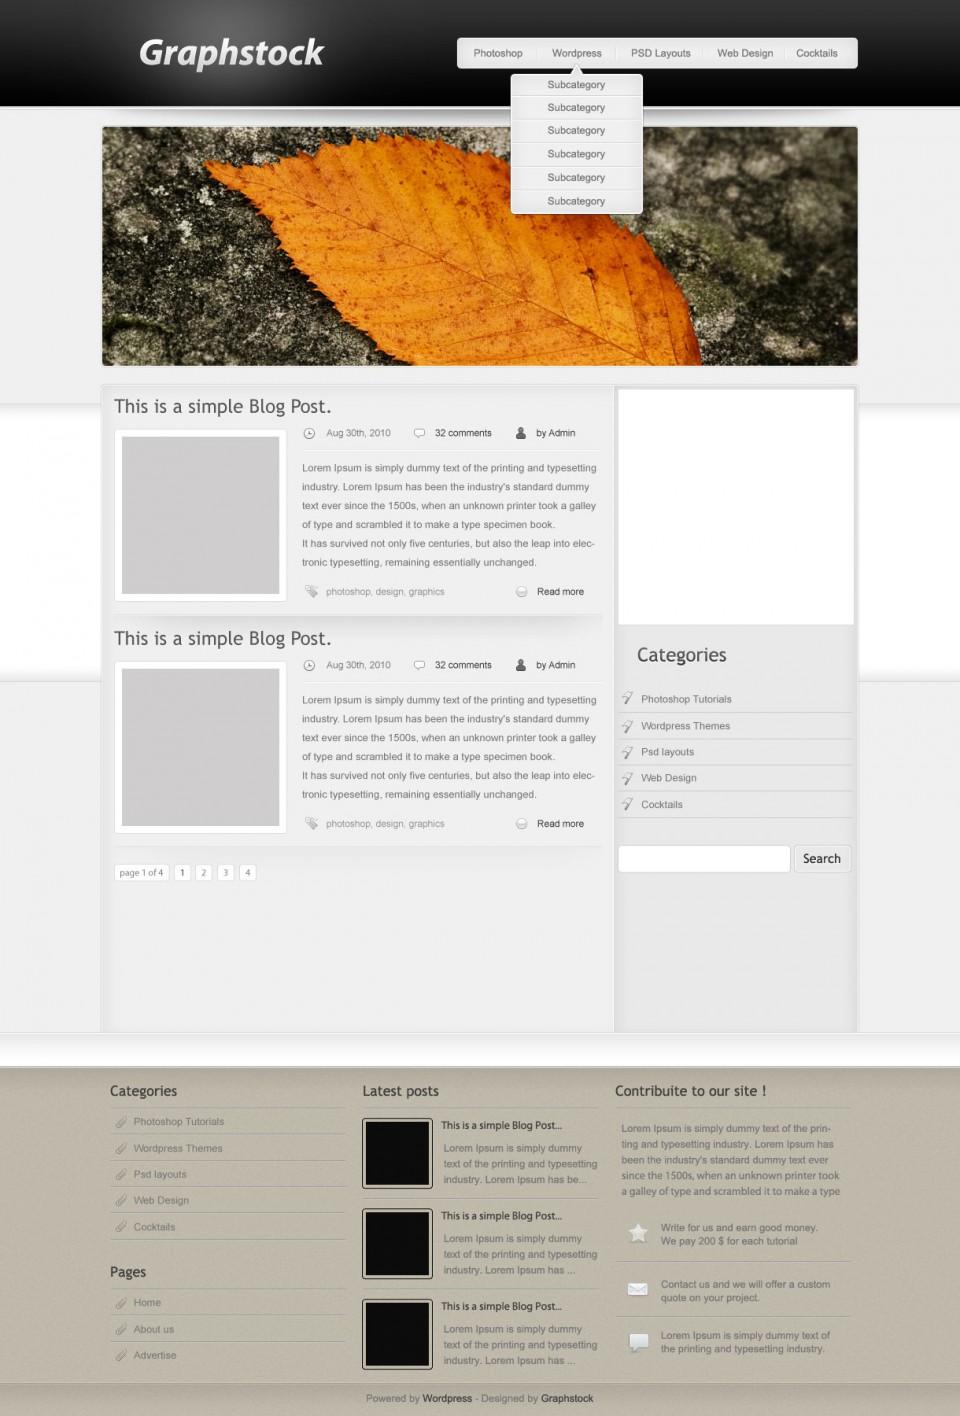 how to create a wordpress.org account